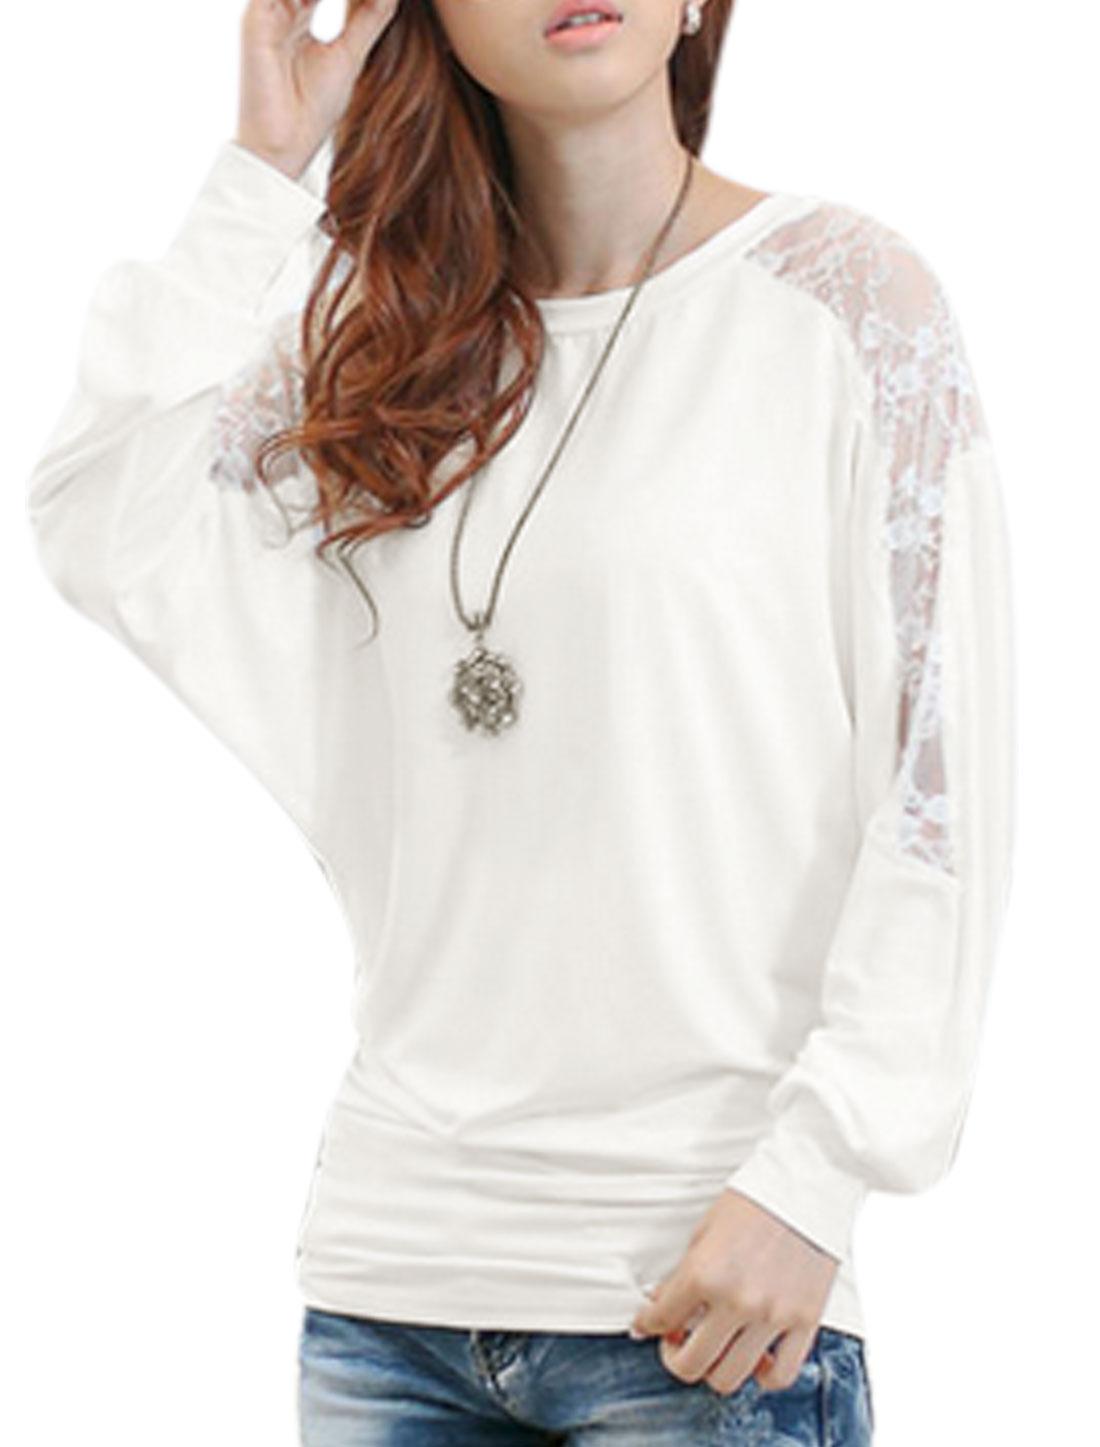 Ladies Semi Sheer Lace Panel Round Neck White Shirt XS